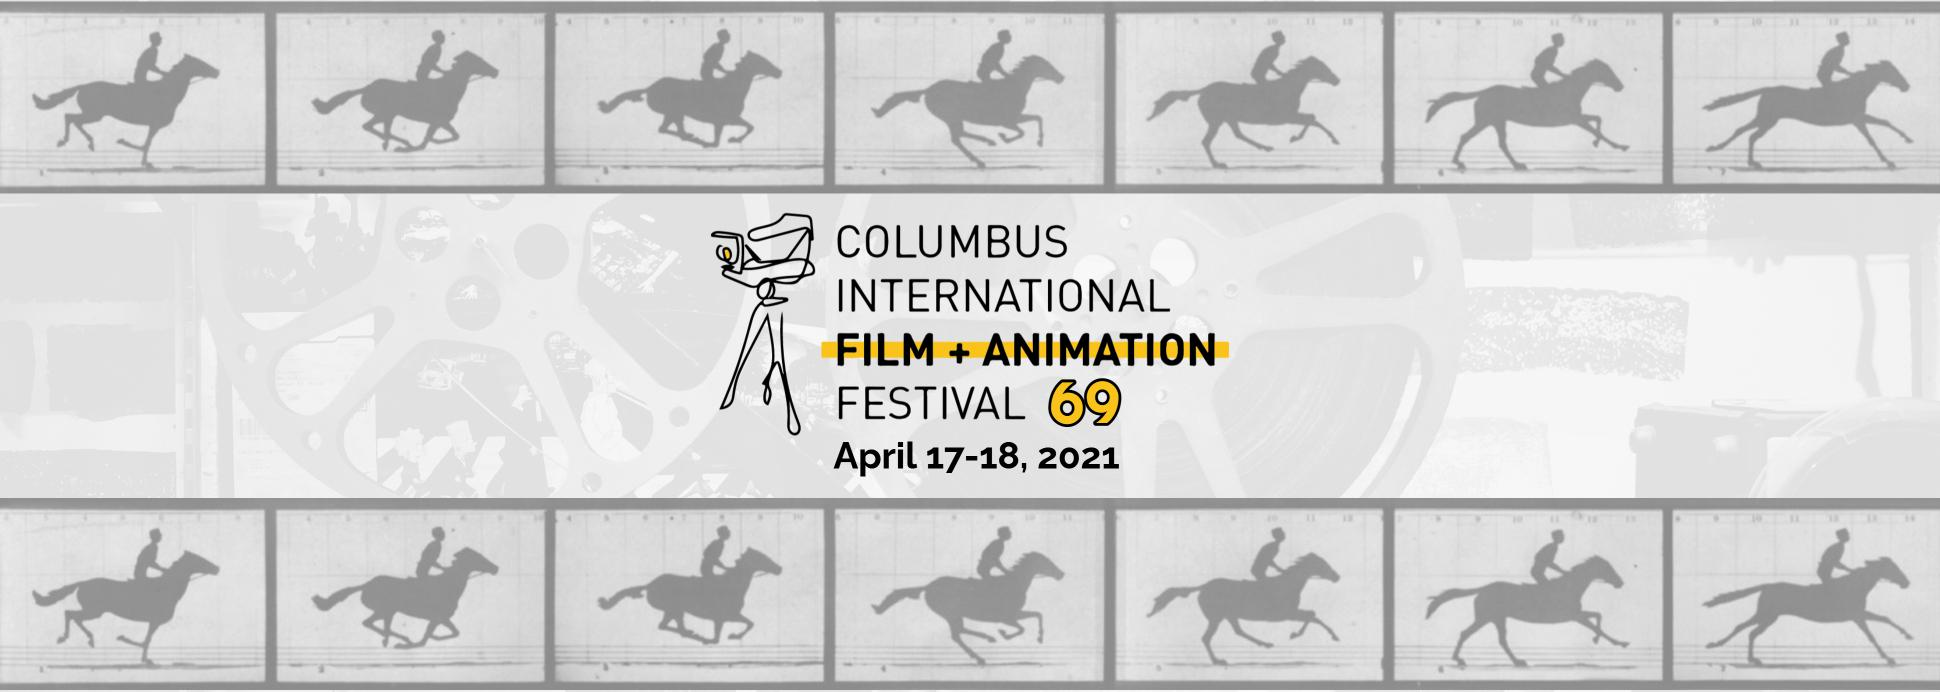 Columbus International Film and Animation Festival 2021